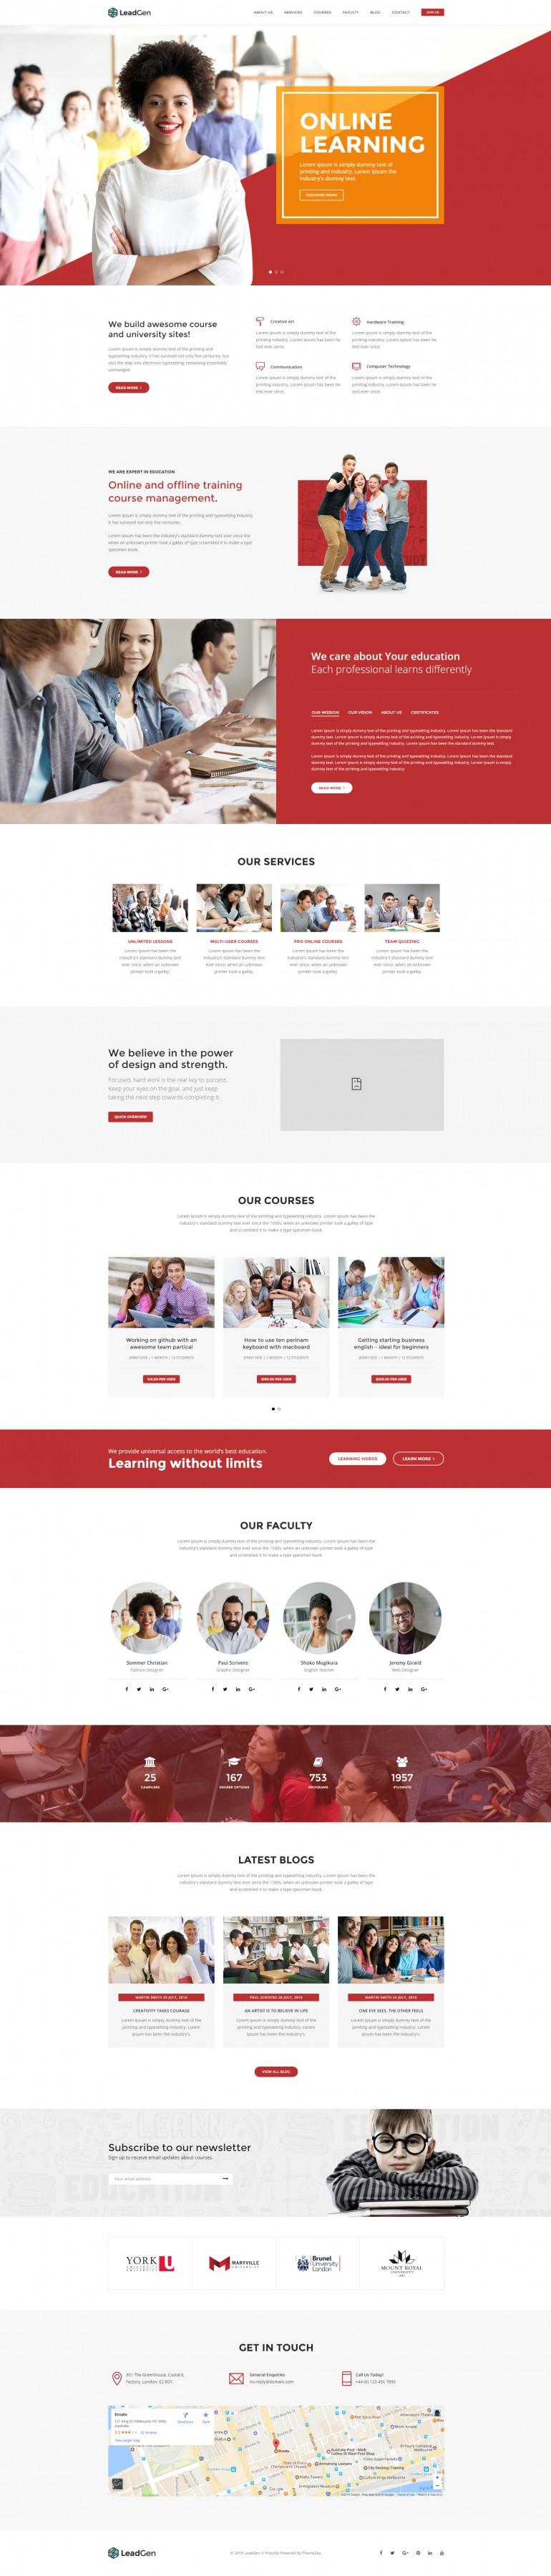 LeadGen – Multipurpose Marketing Landing Page – E-Learning